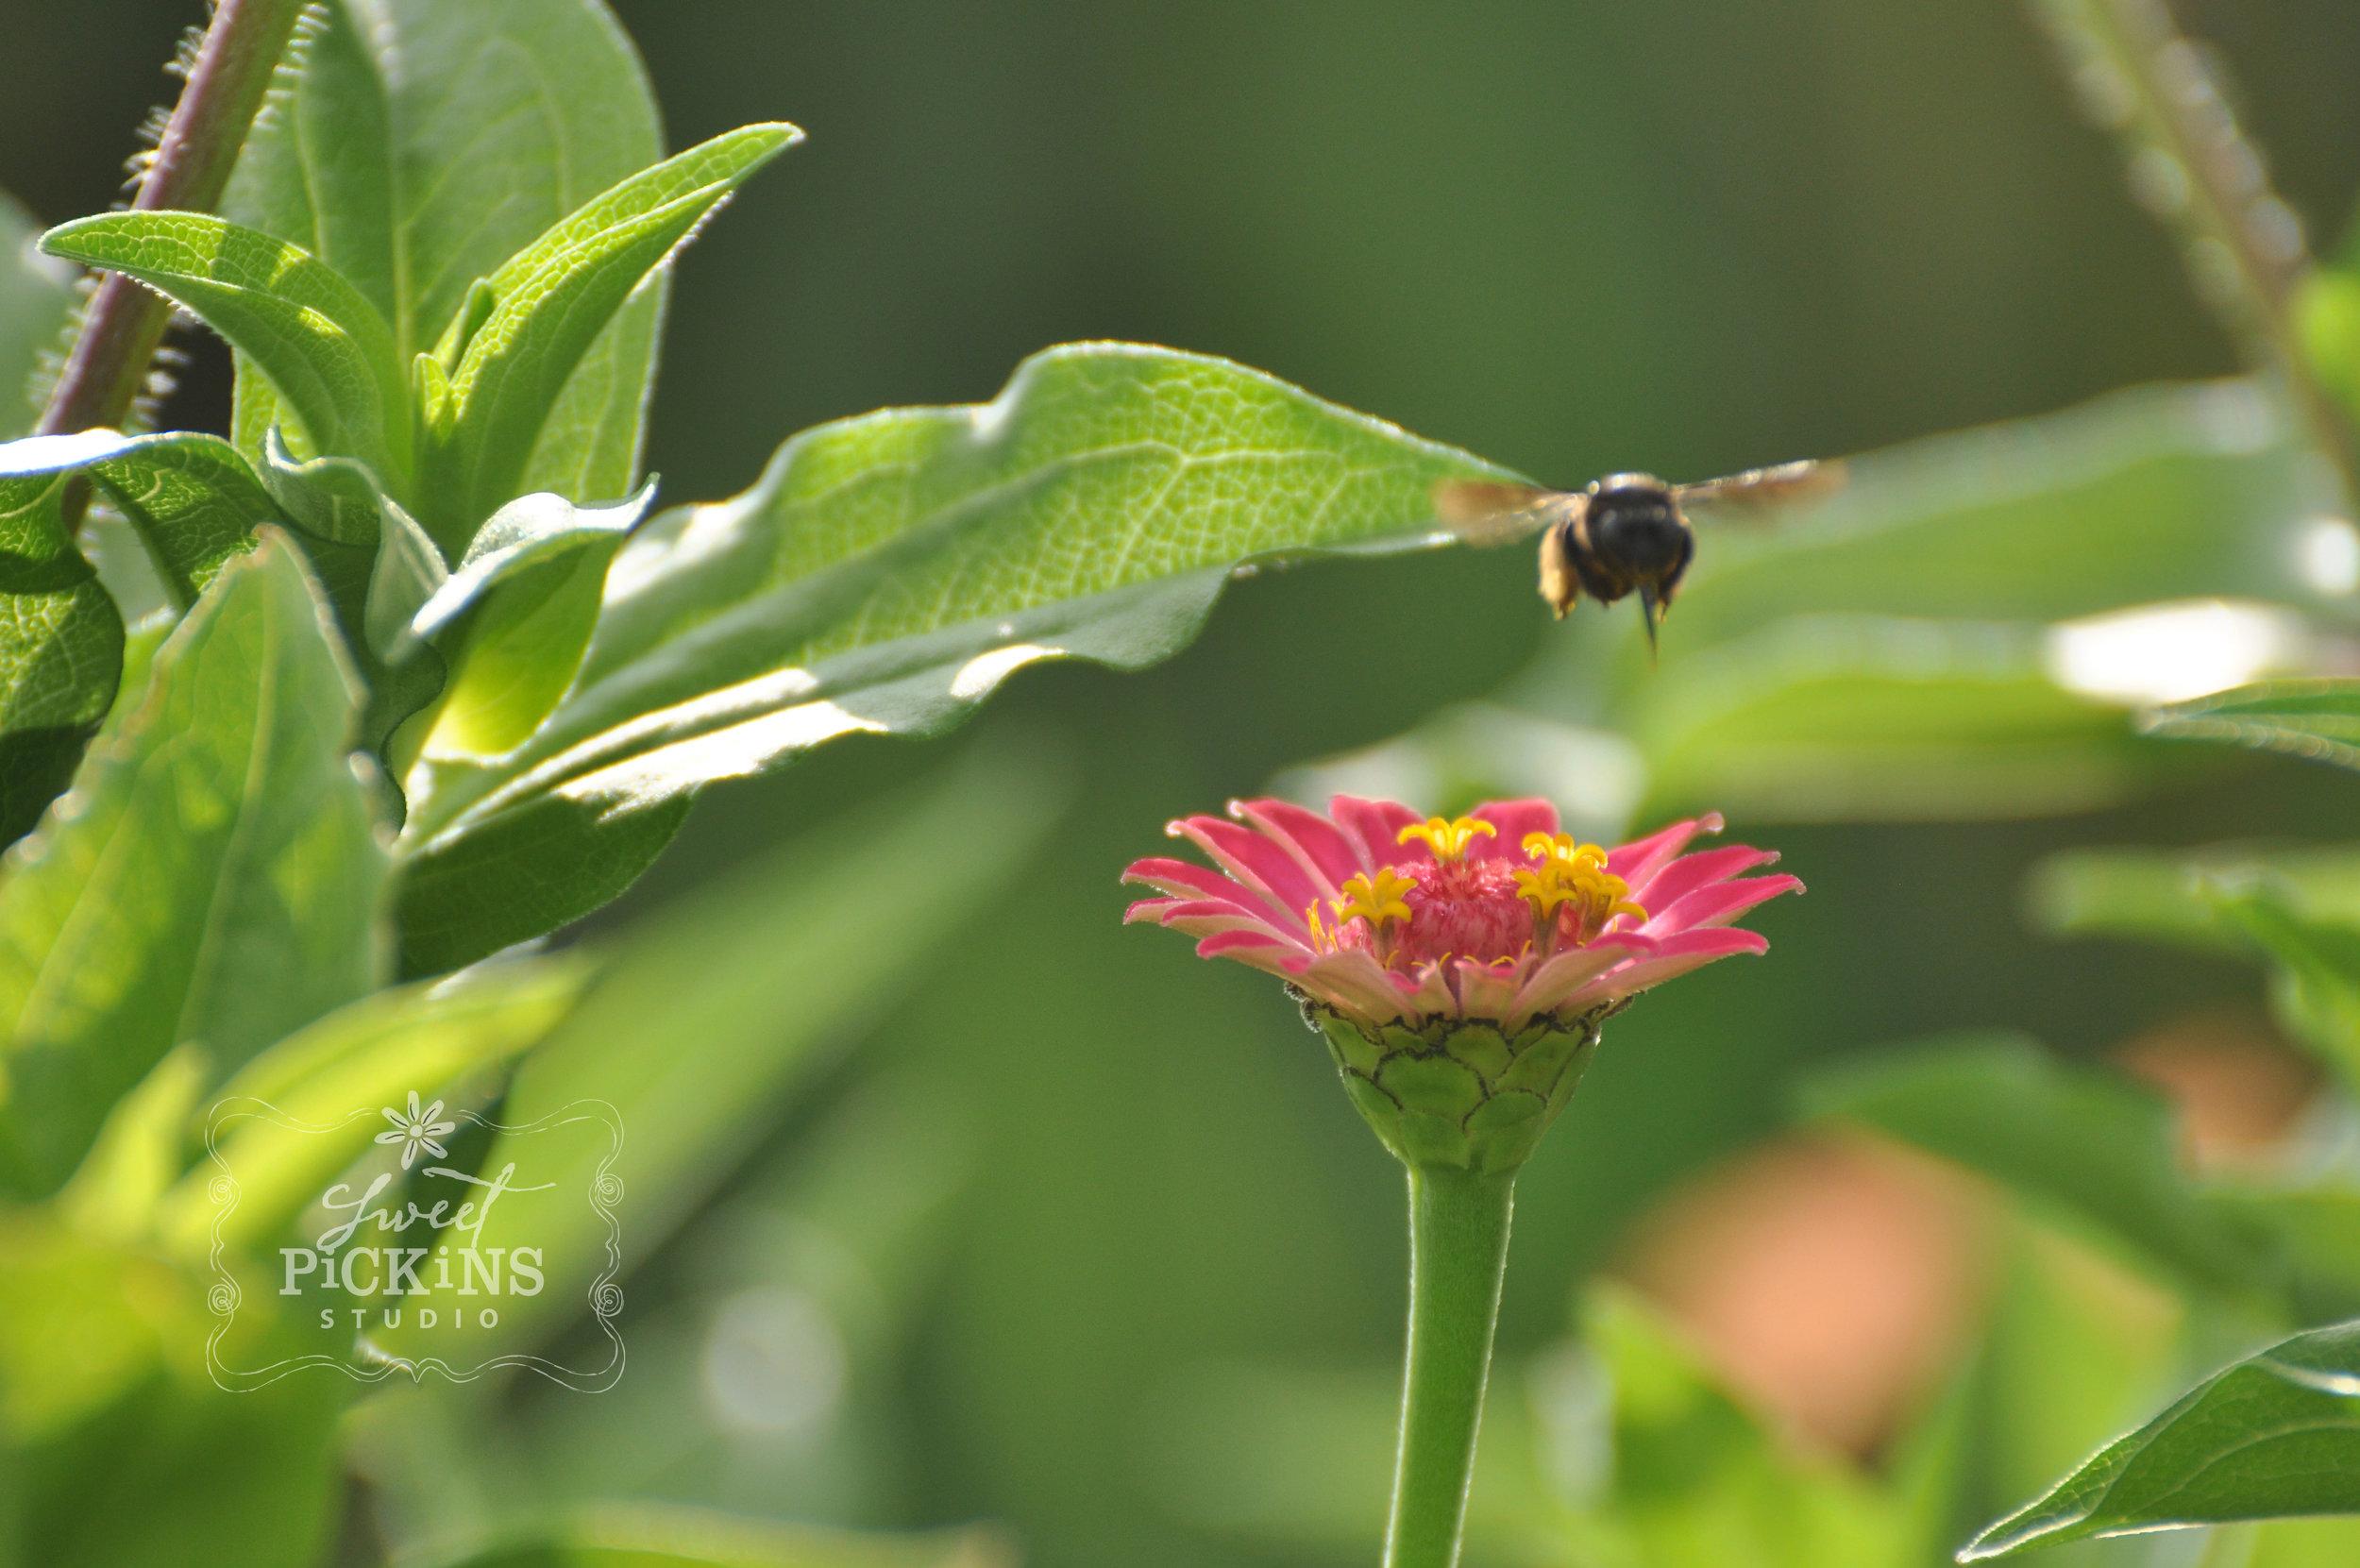 Bee and Zinnias in Garden | Sweet Pickins Studio Photography